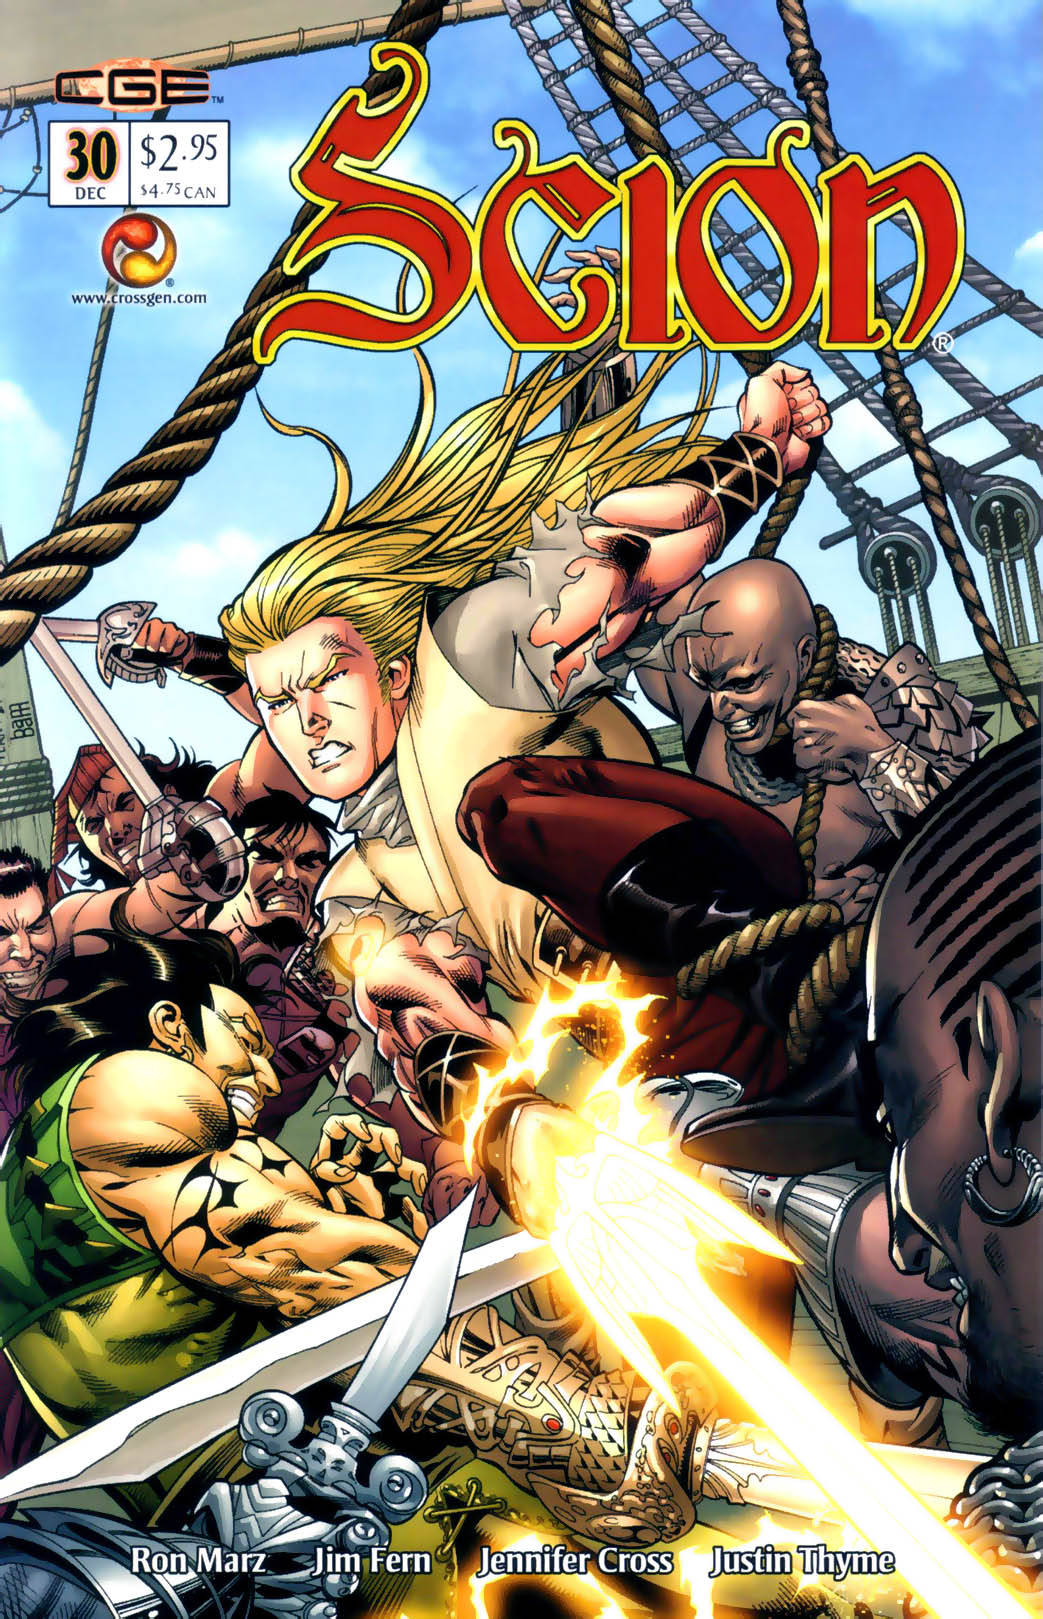 Read online Scion comic -  Issue #30 - 1